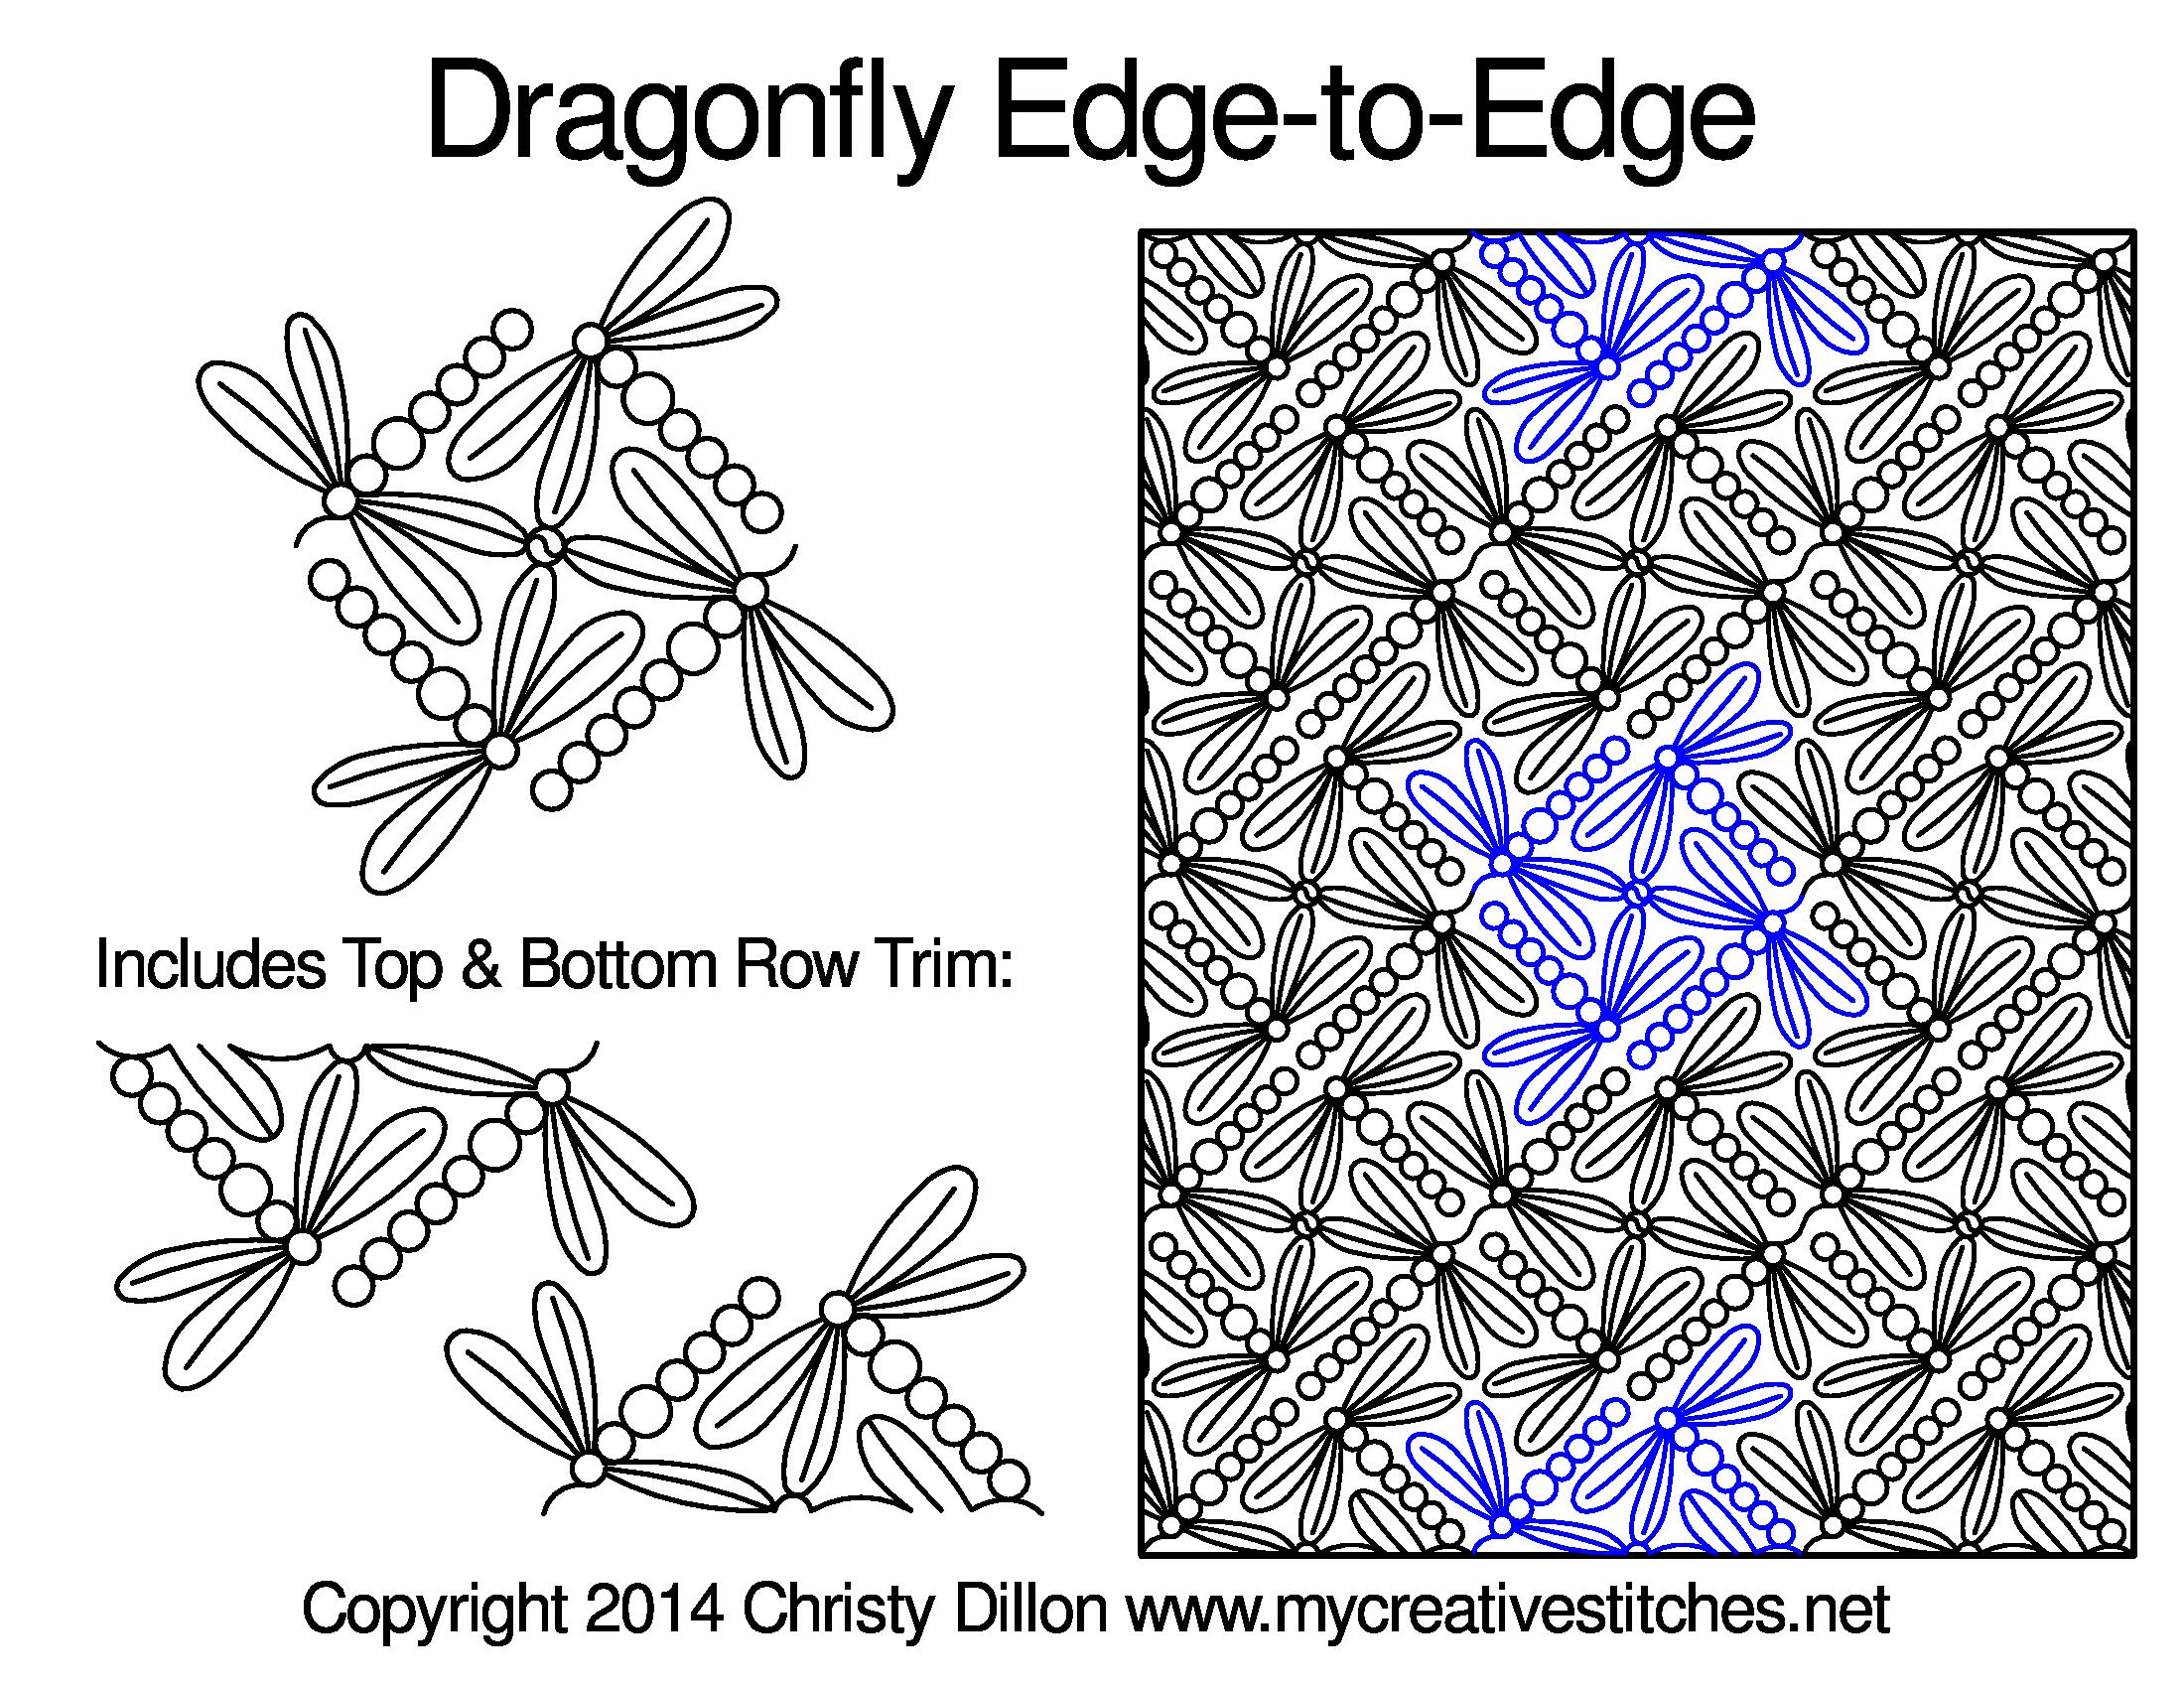 dragonfly-e2e.jpg